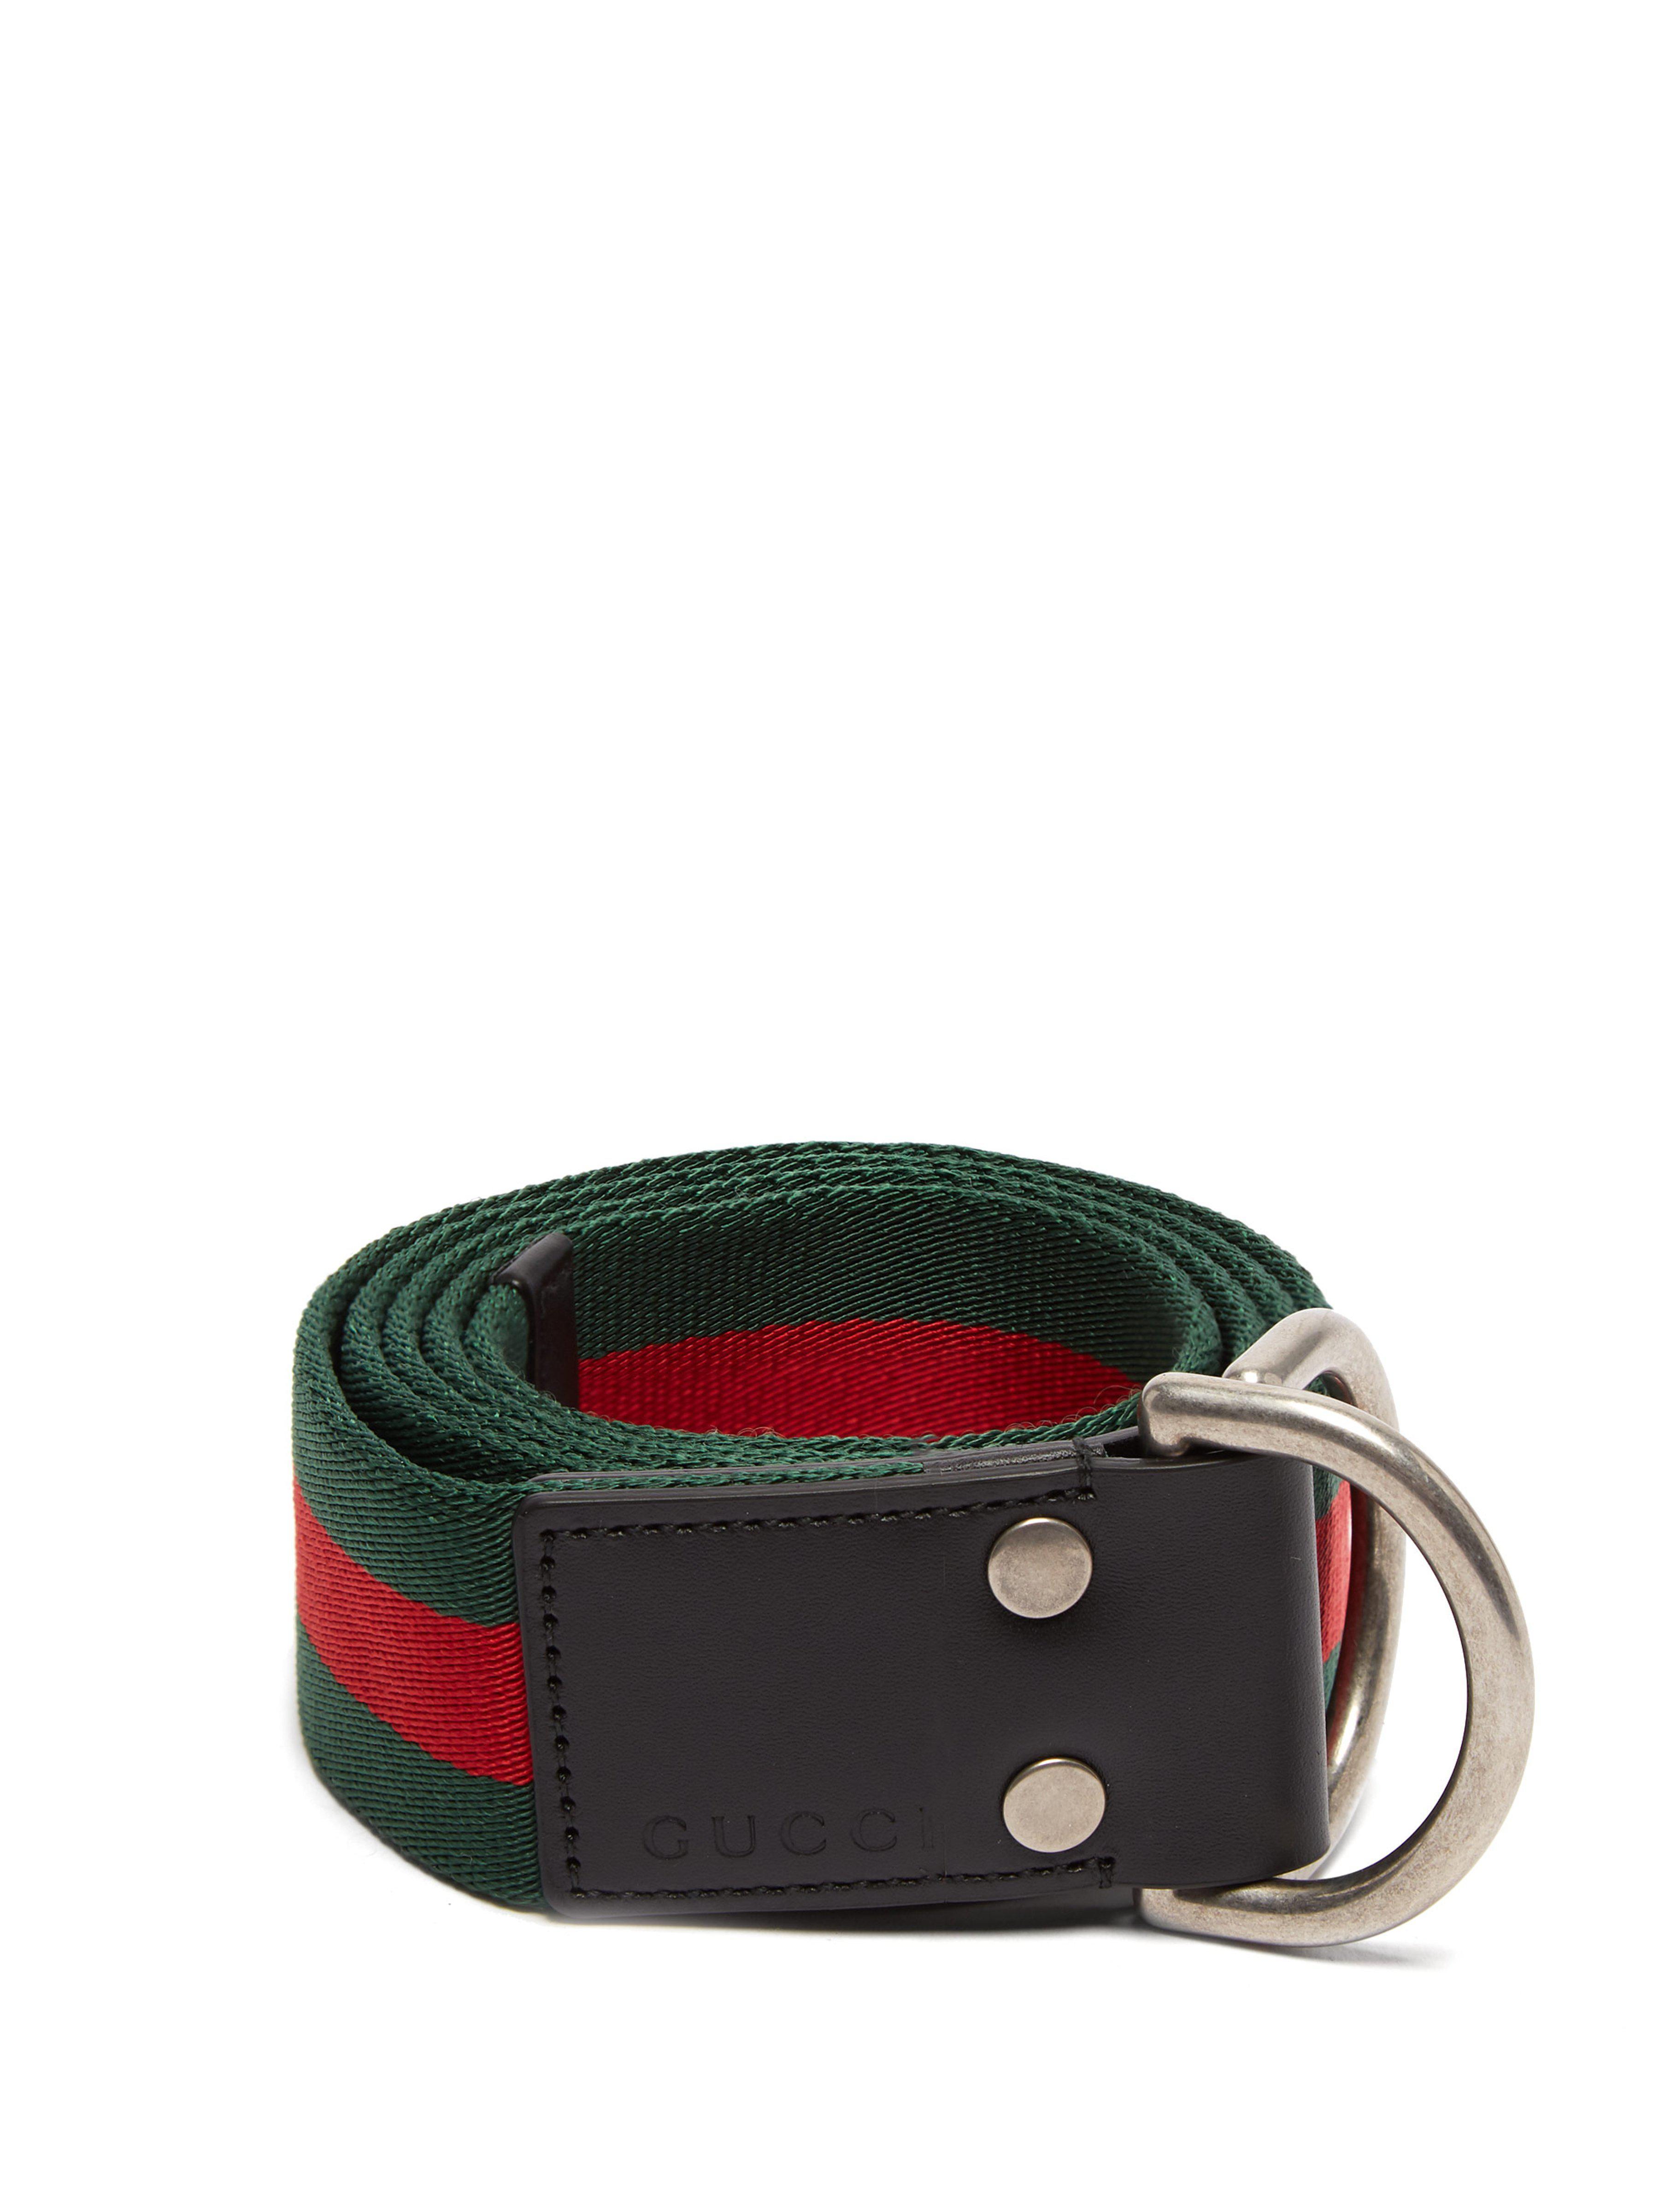 9f142492b94 Gucci - Green Web Striped Canvas Belt for Men - Lyst. View fullscreen